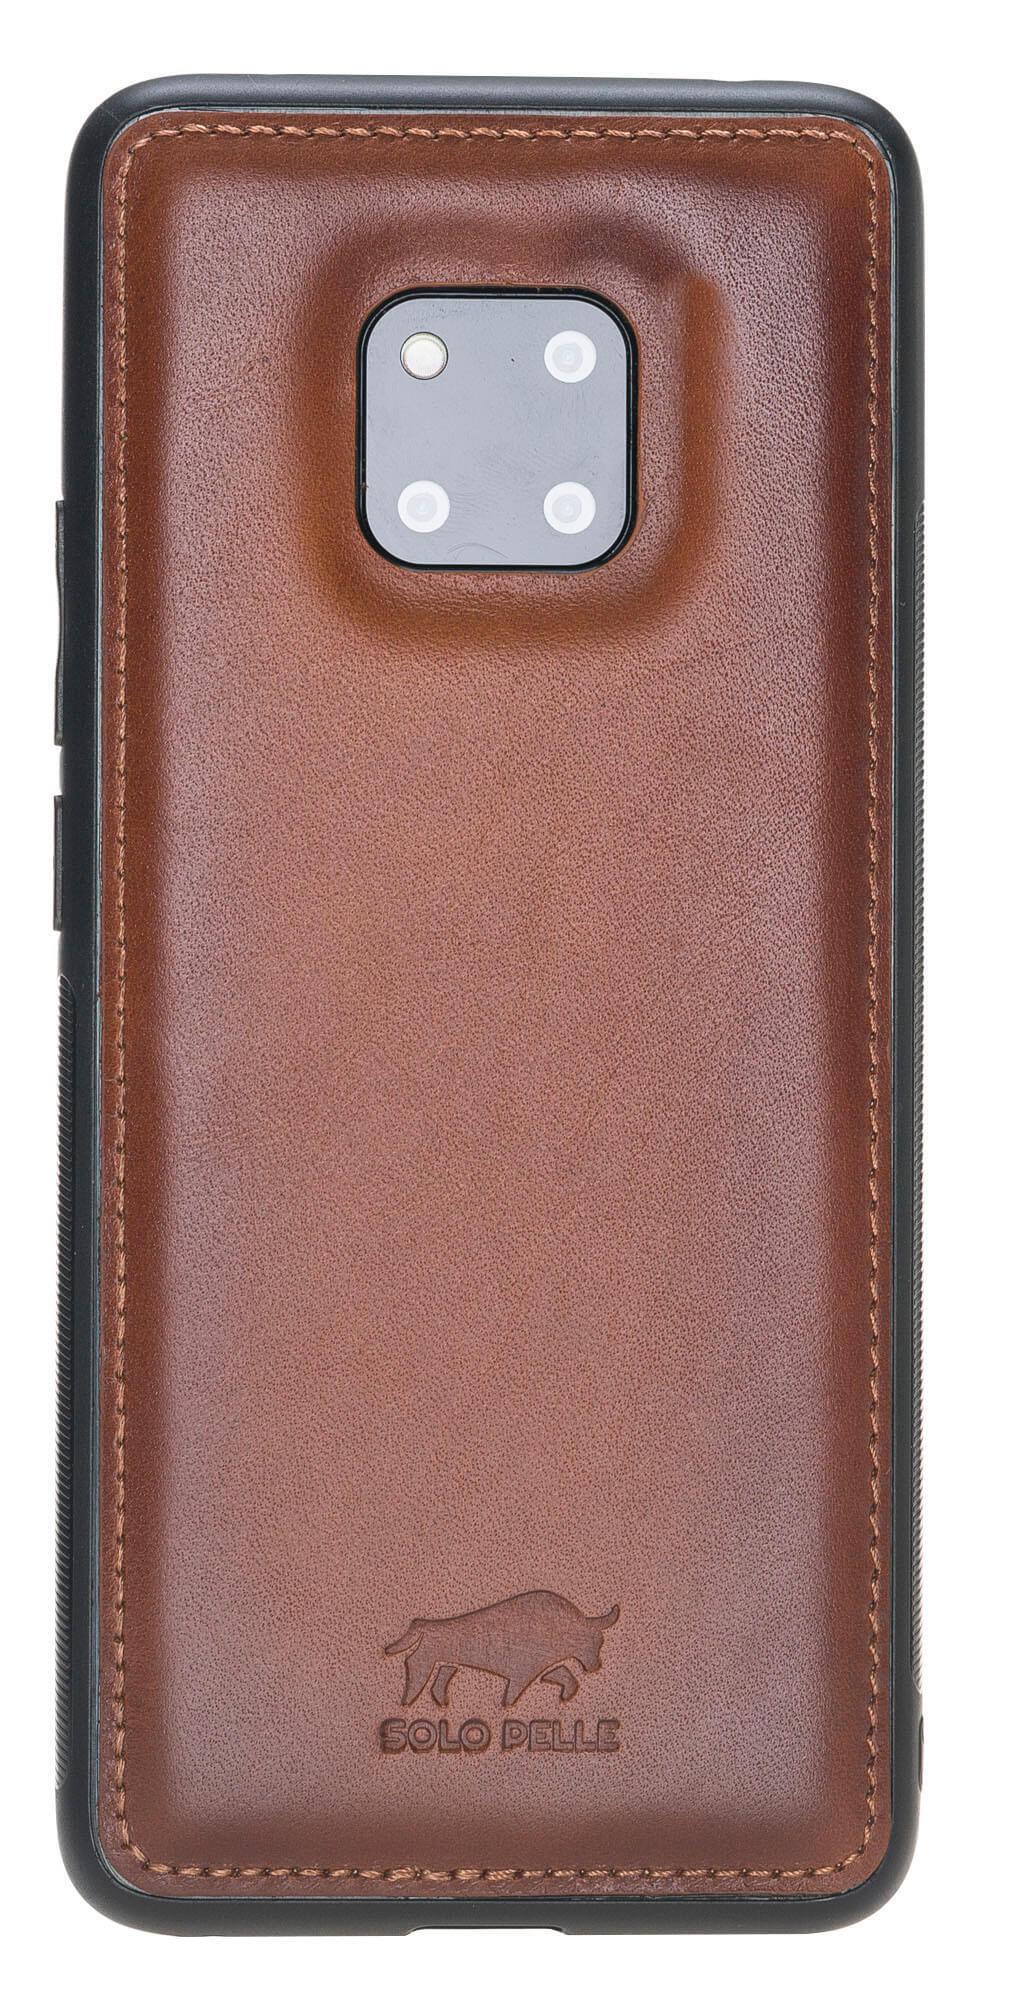 Lederhülle für das Huawei Mate 20 Pro aus echtem Leder in Cognac Braun Burned